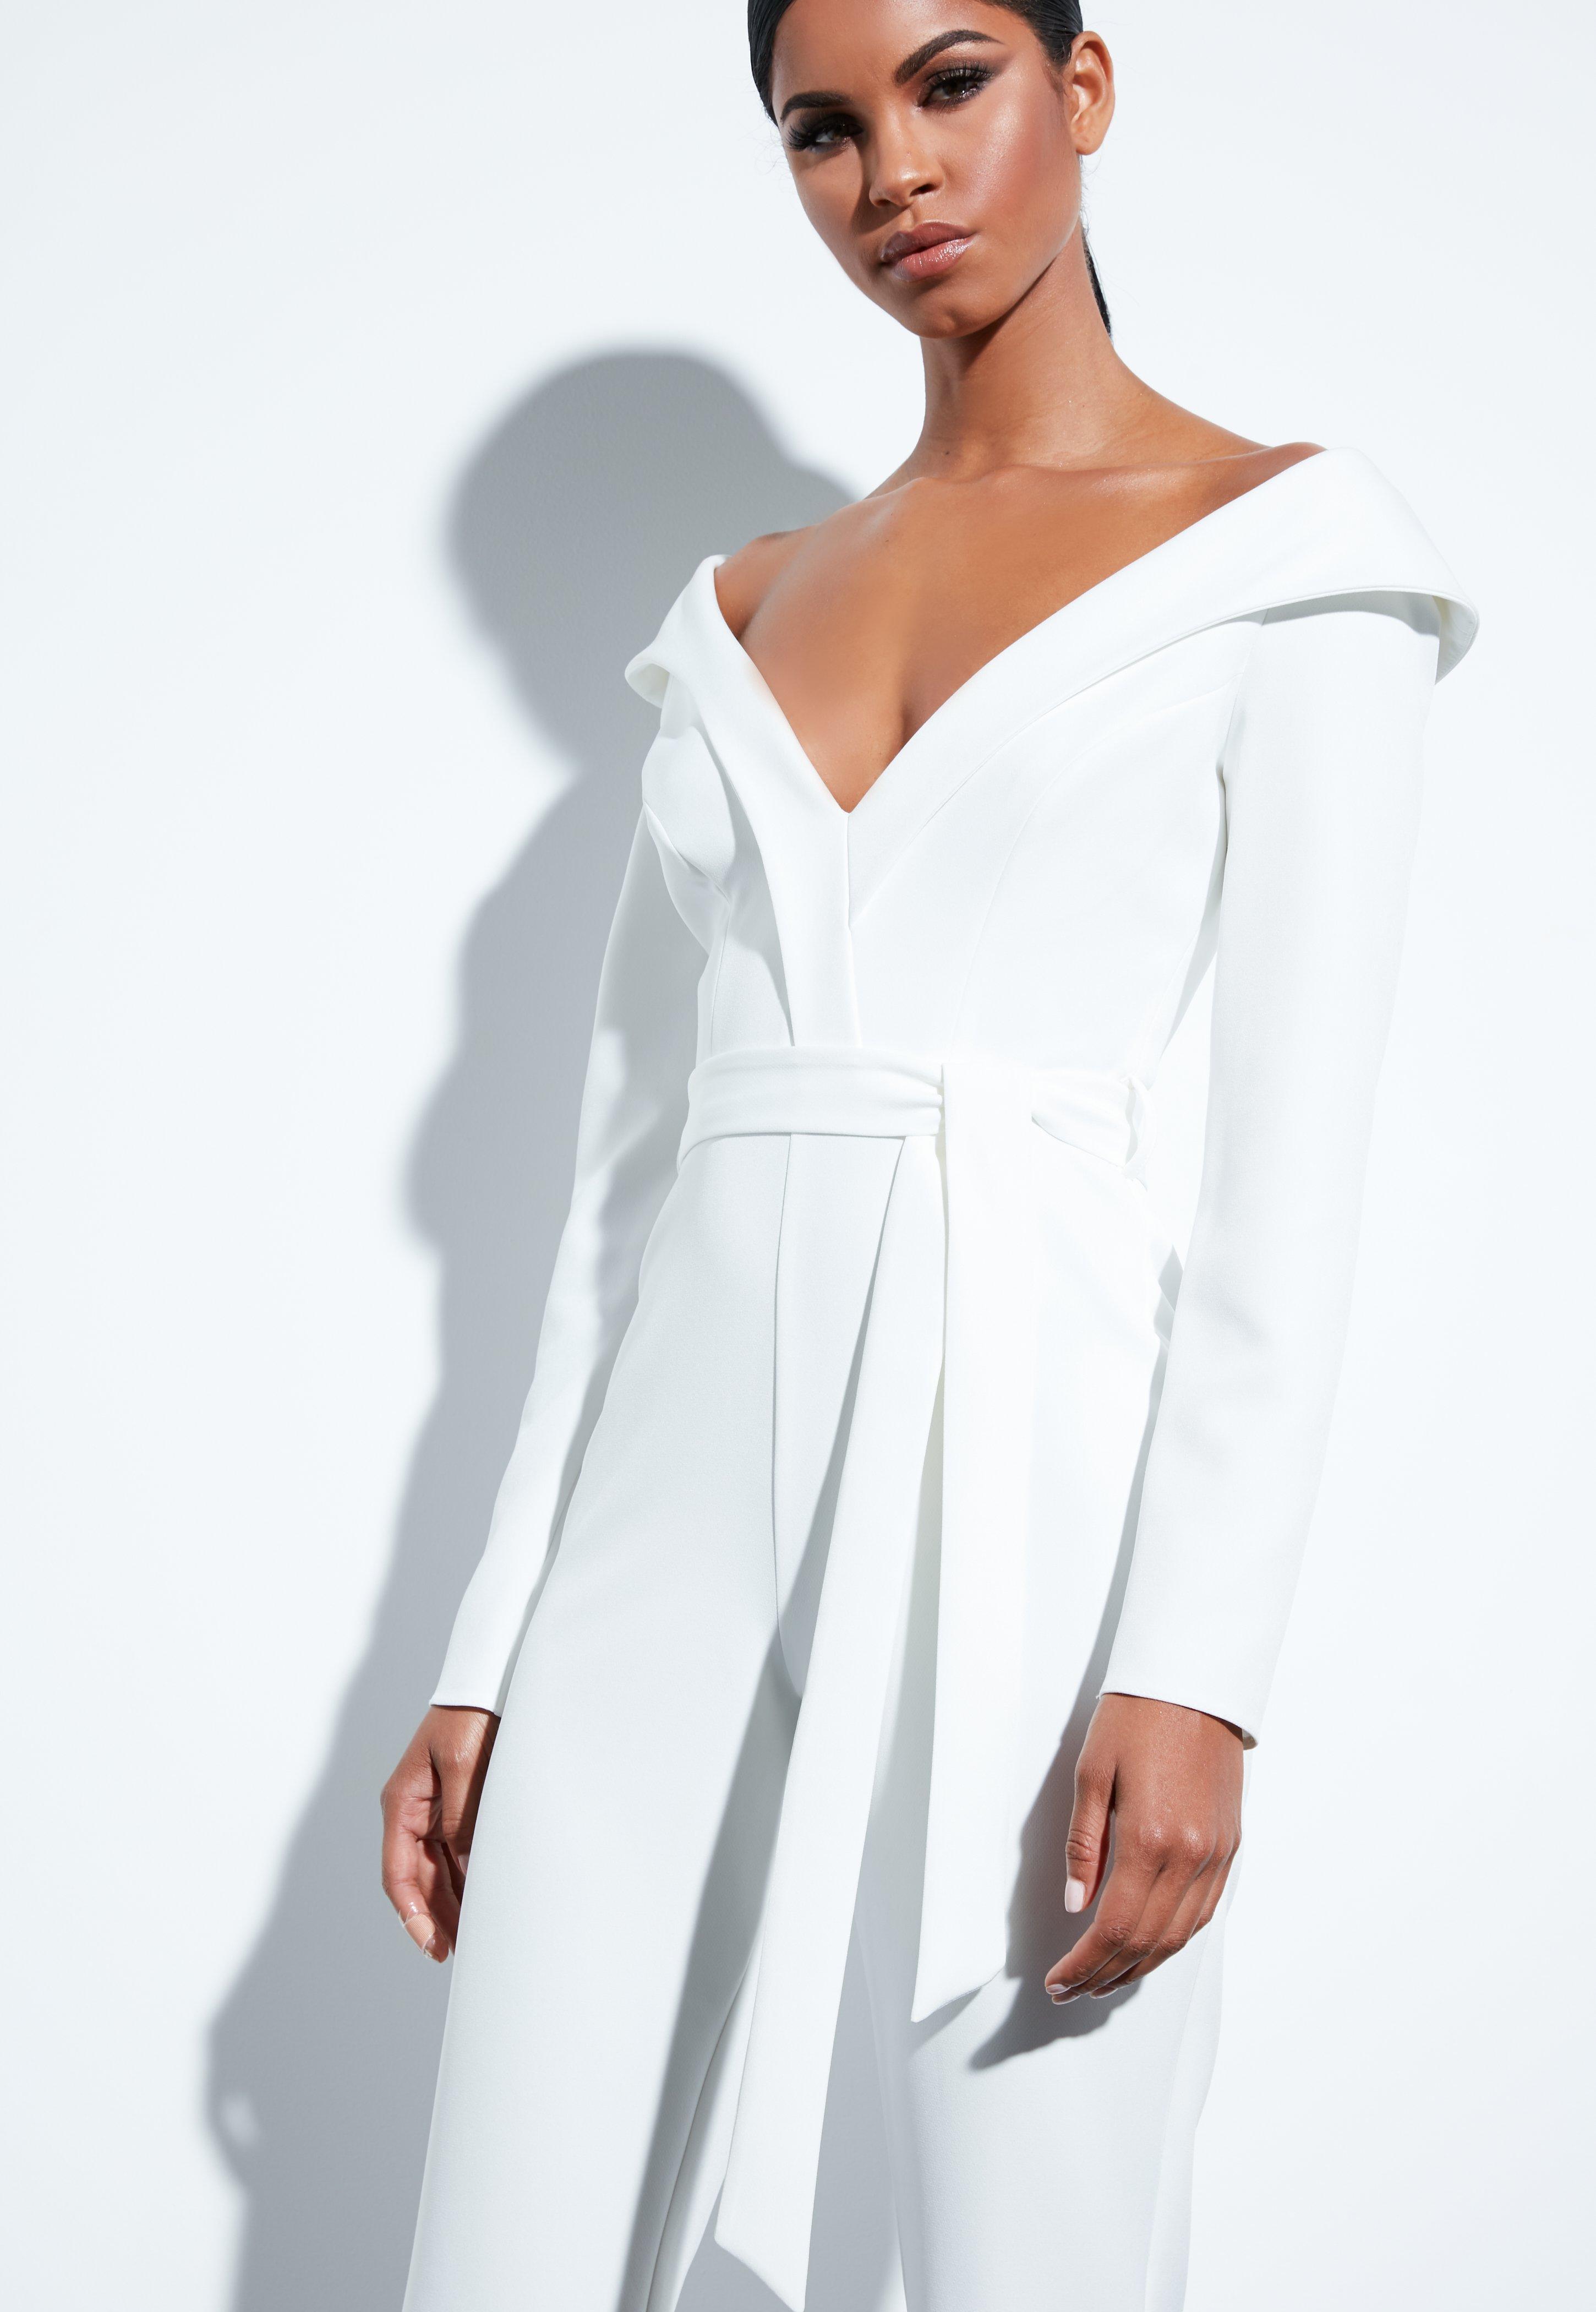 4cdf0b02a289 Missguided - Peace + Love White Bardot Flared Jumpsuit - Lyst. View  fullscreen